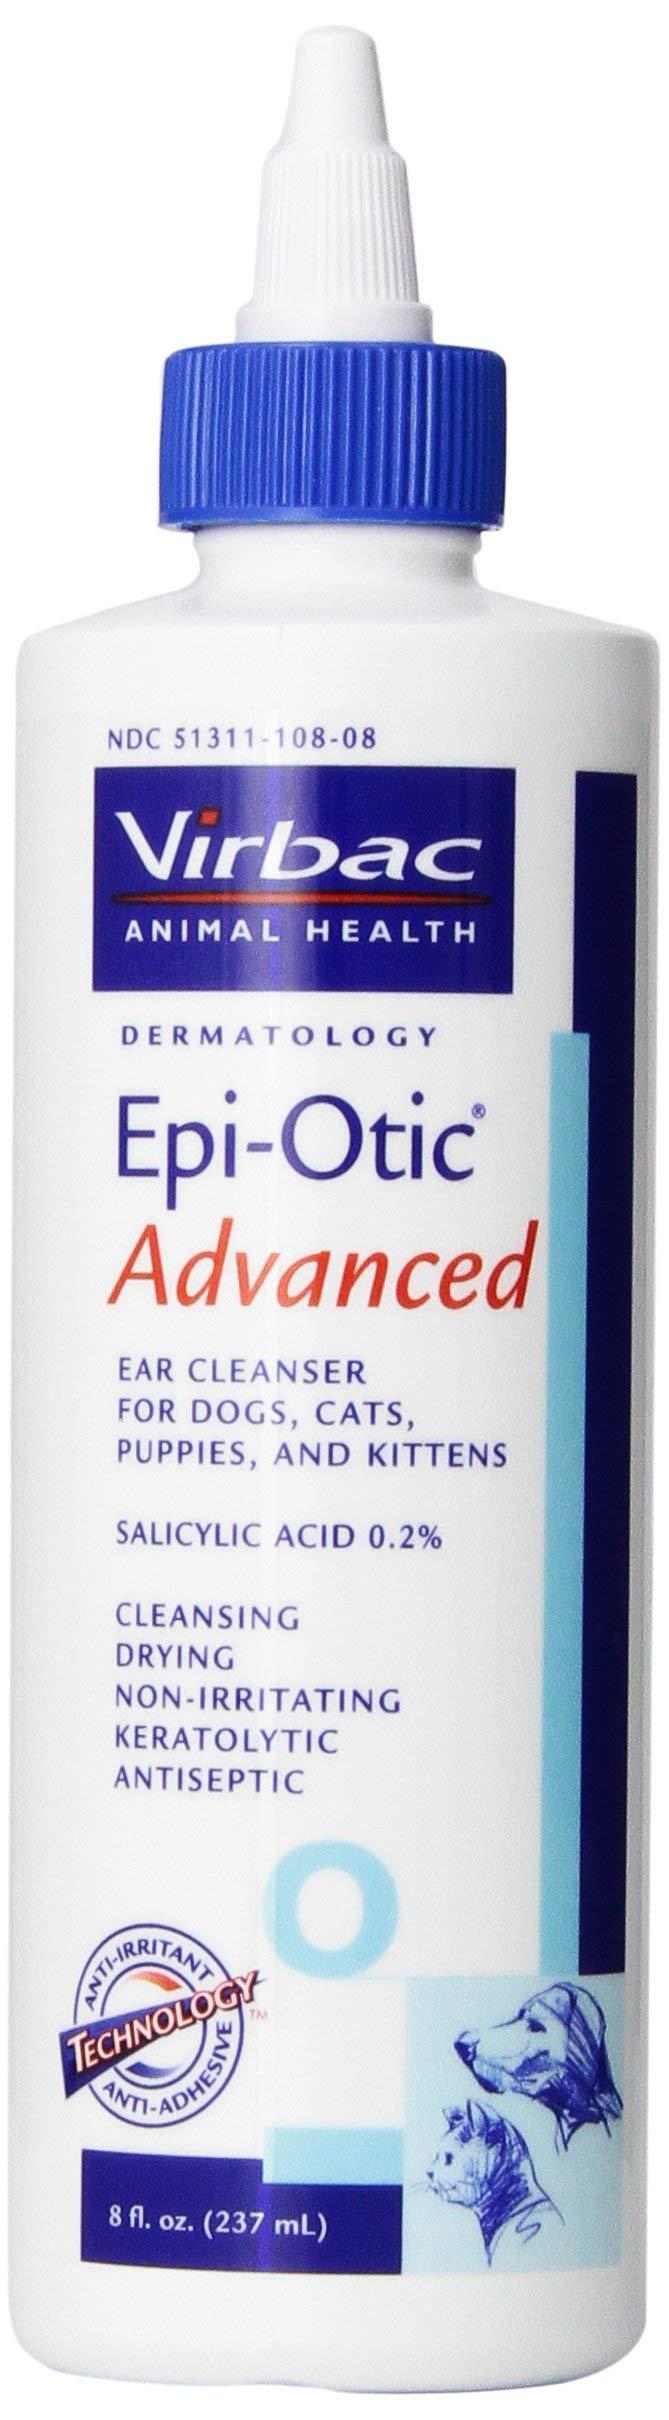 Premium Pack Epi-Otic Advanced Ear Cleaner, 8 oz